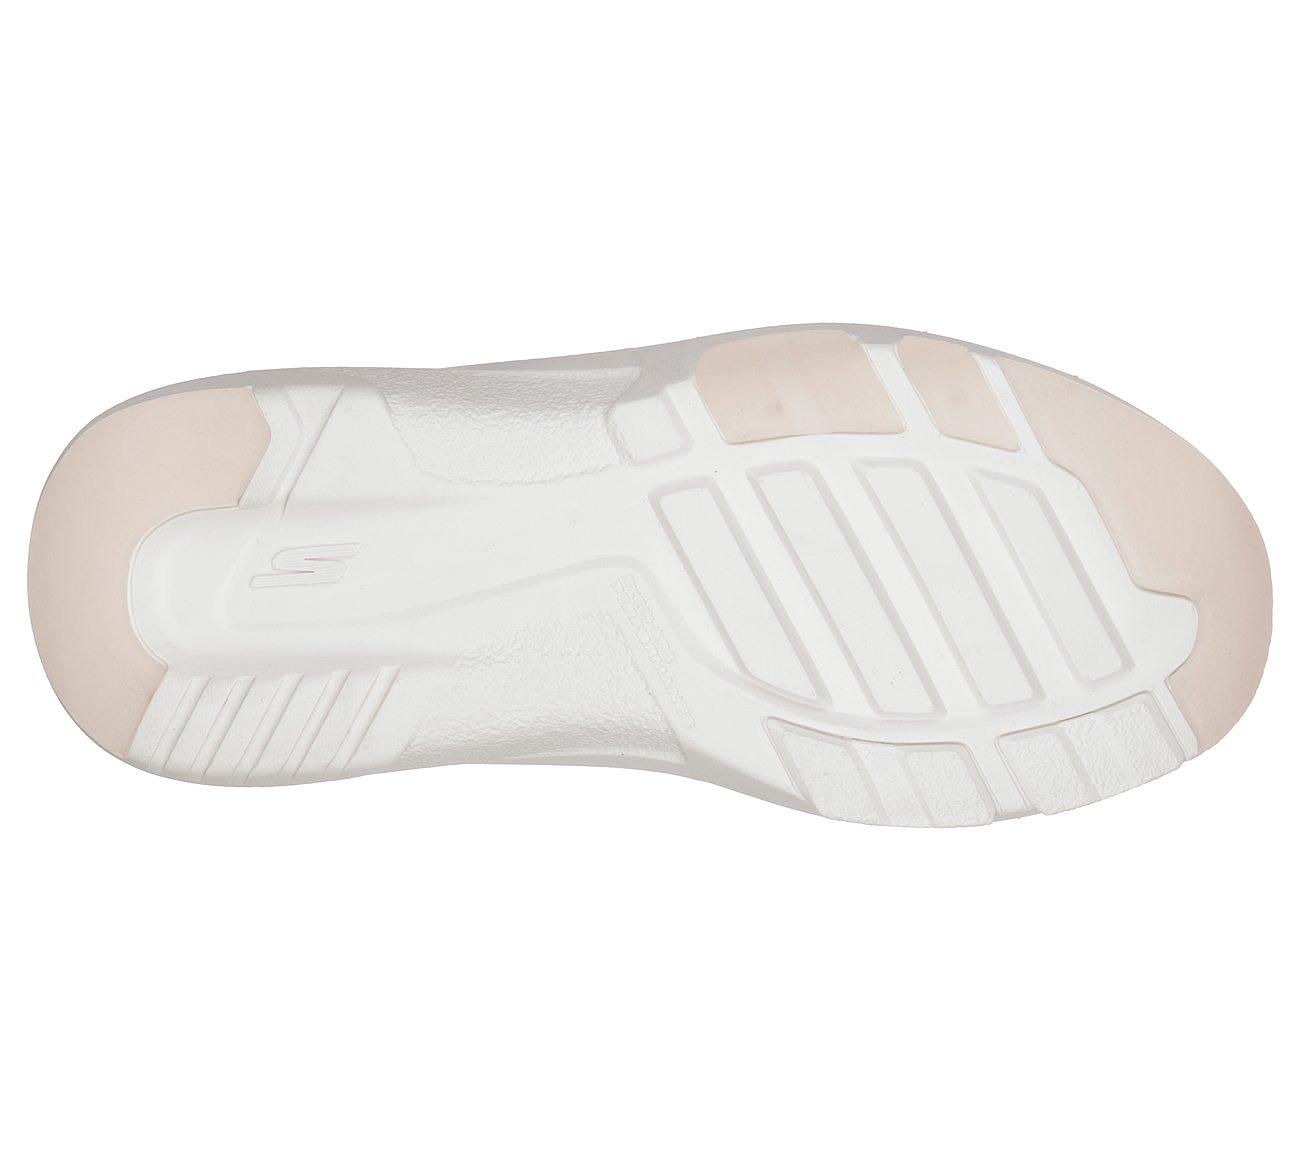 2e3412528c5f Buy SKECHERS Skechers ONE Element Ultra Skechers ONE Shoes only  70.00